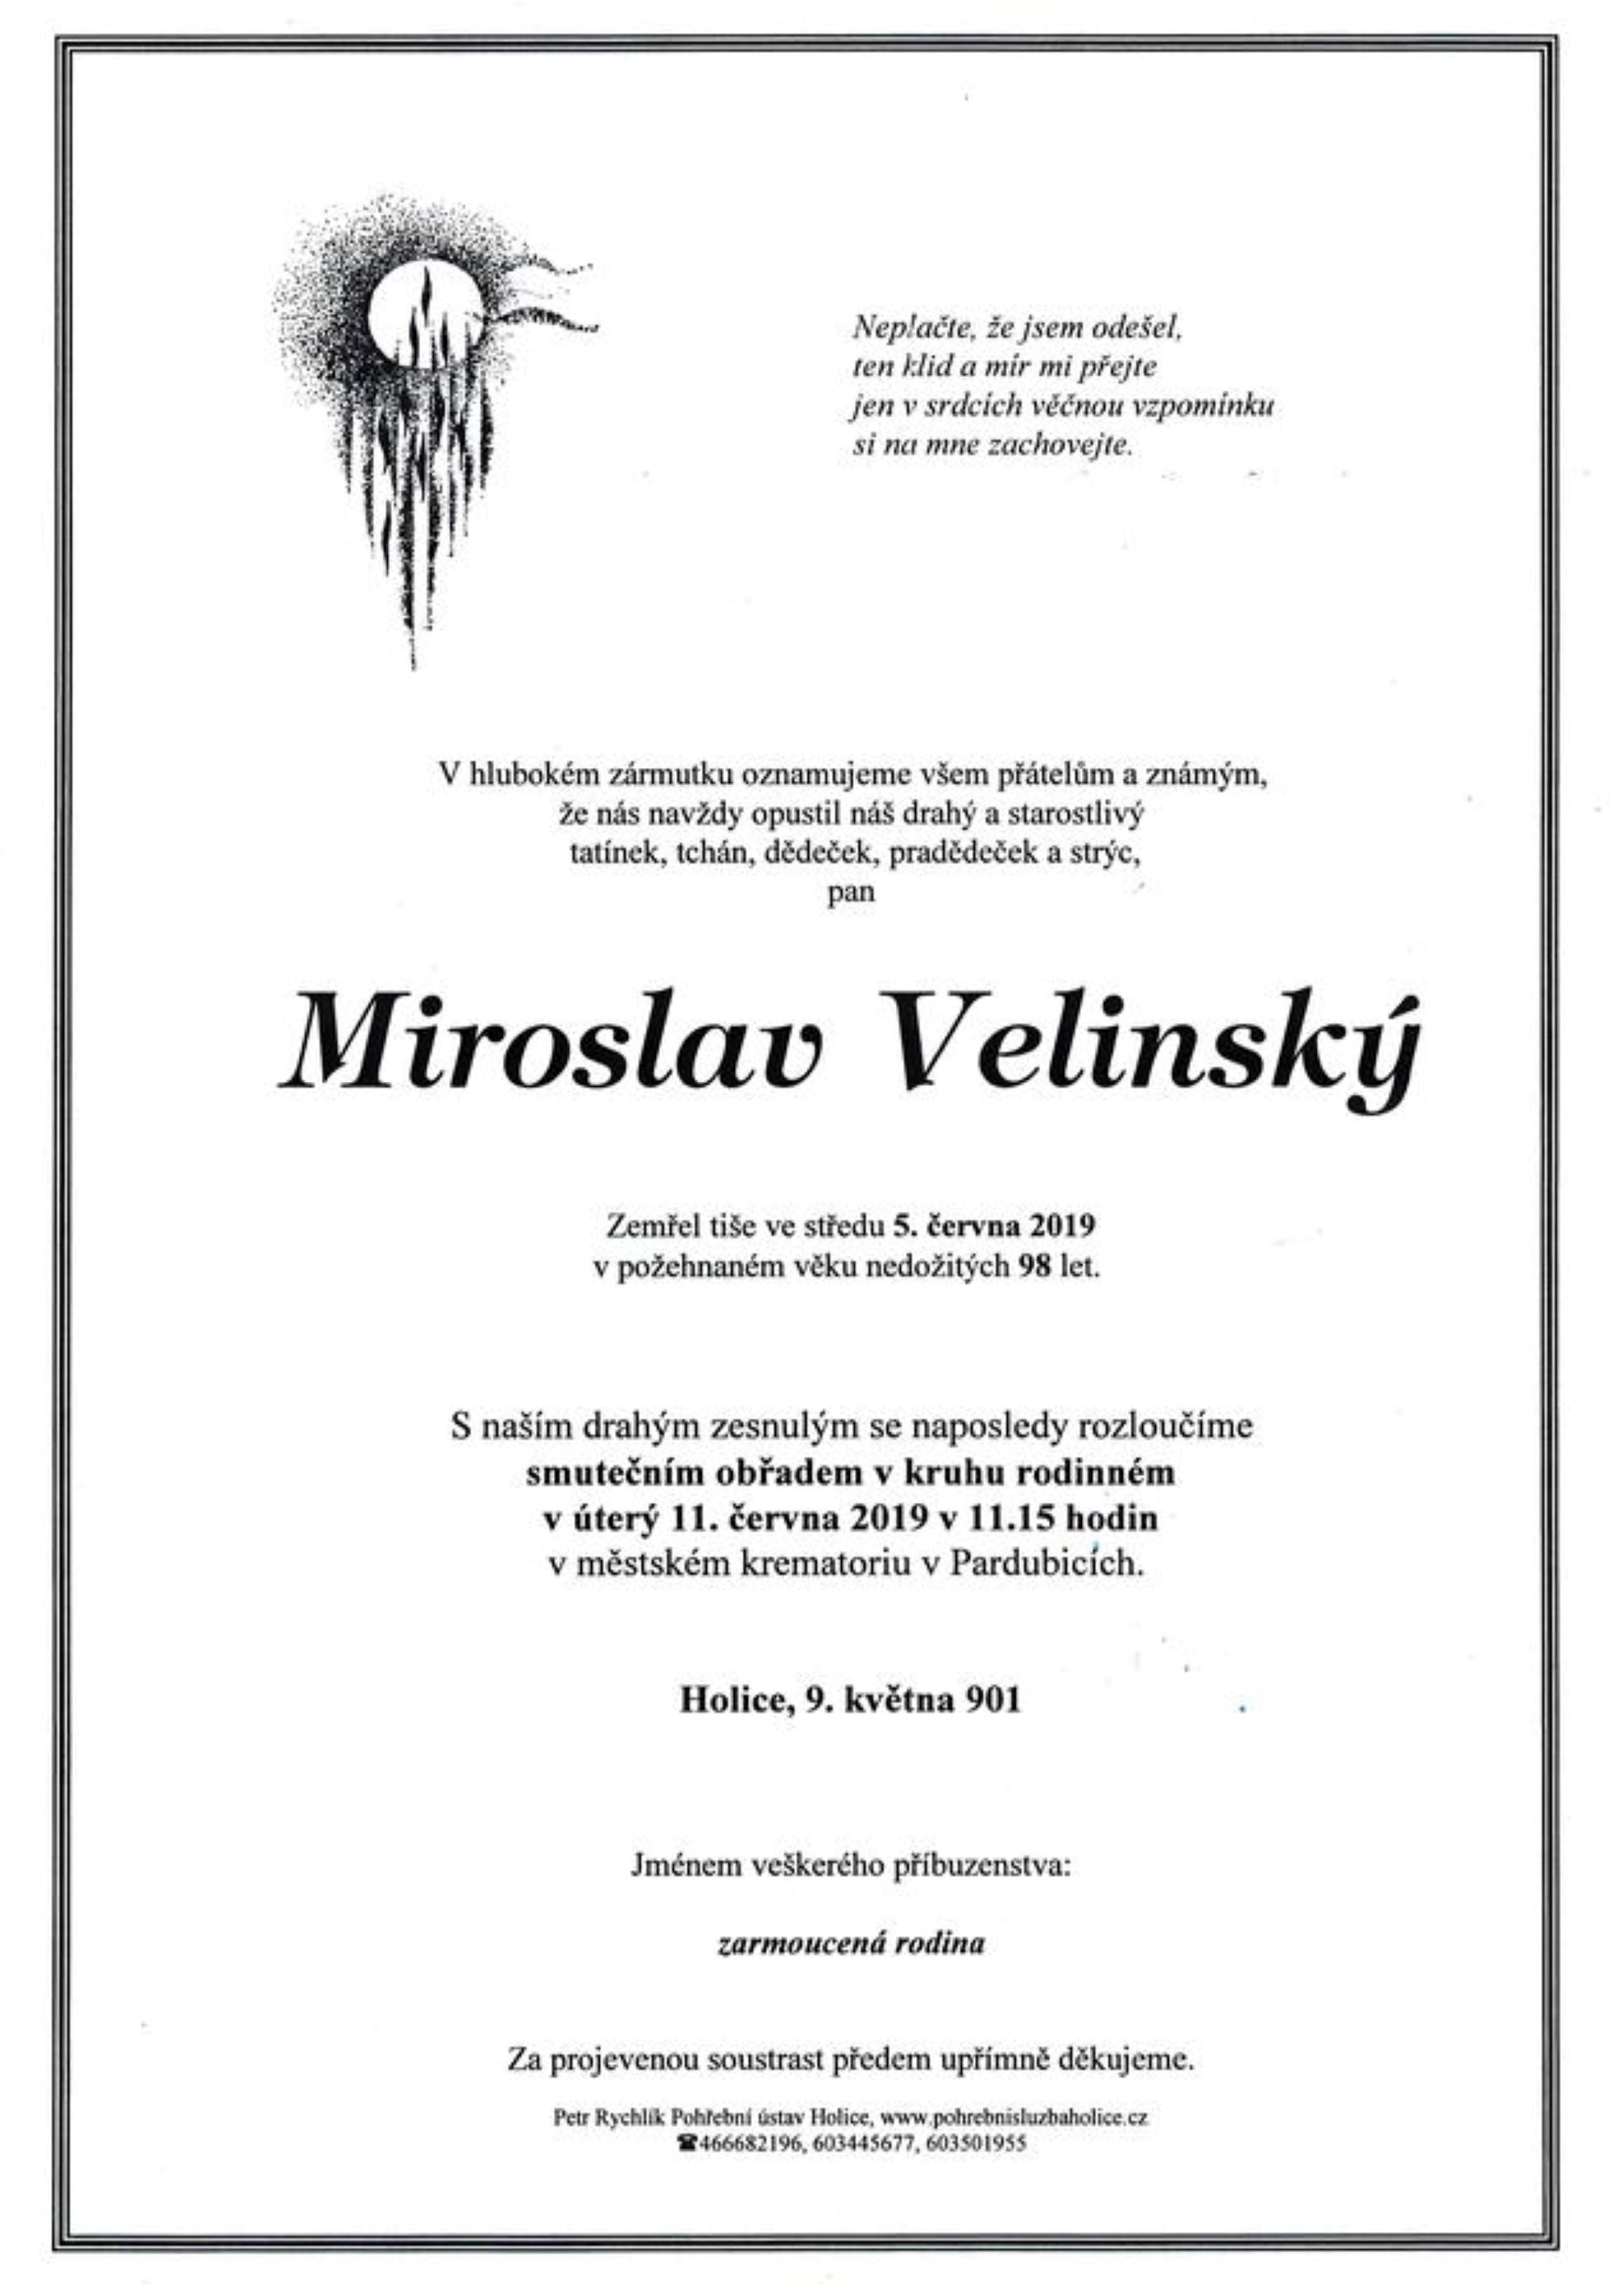 Miroslav Velinský